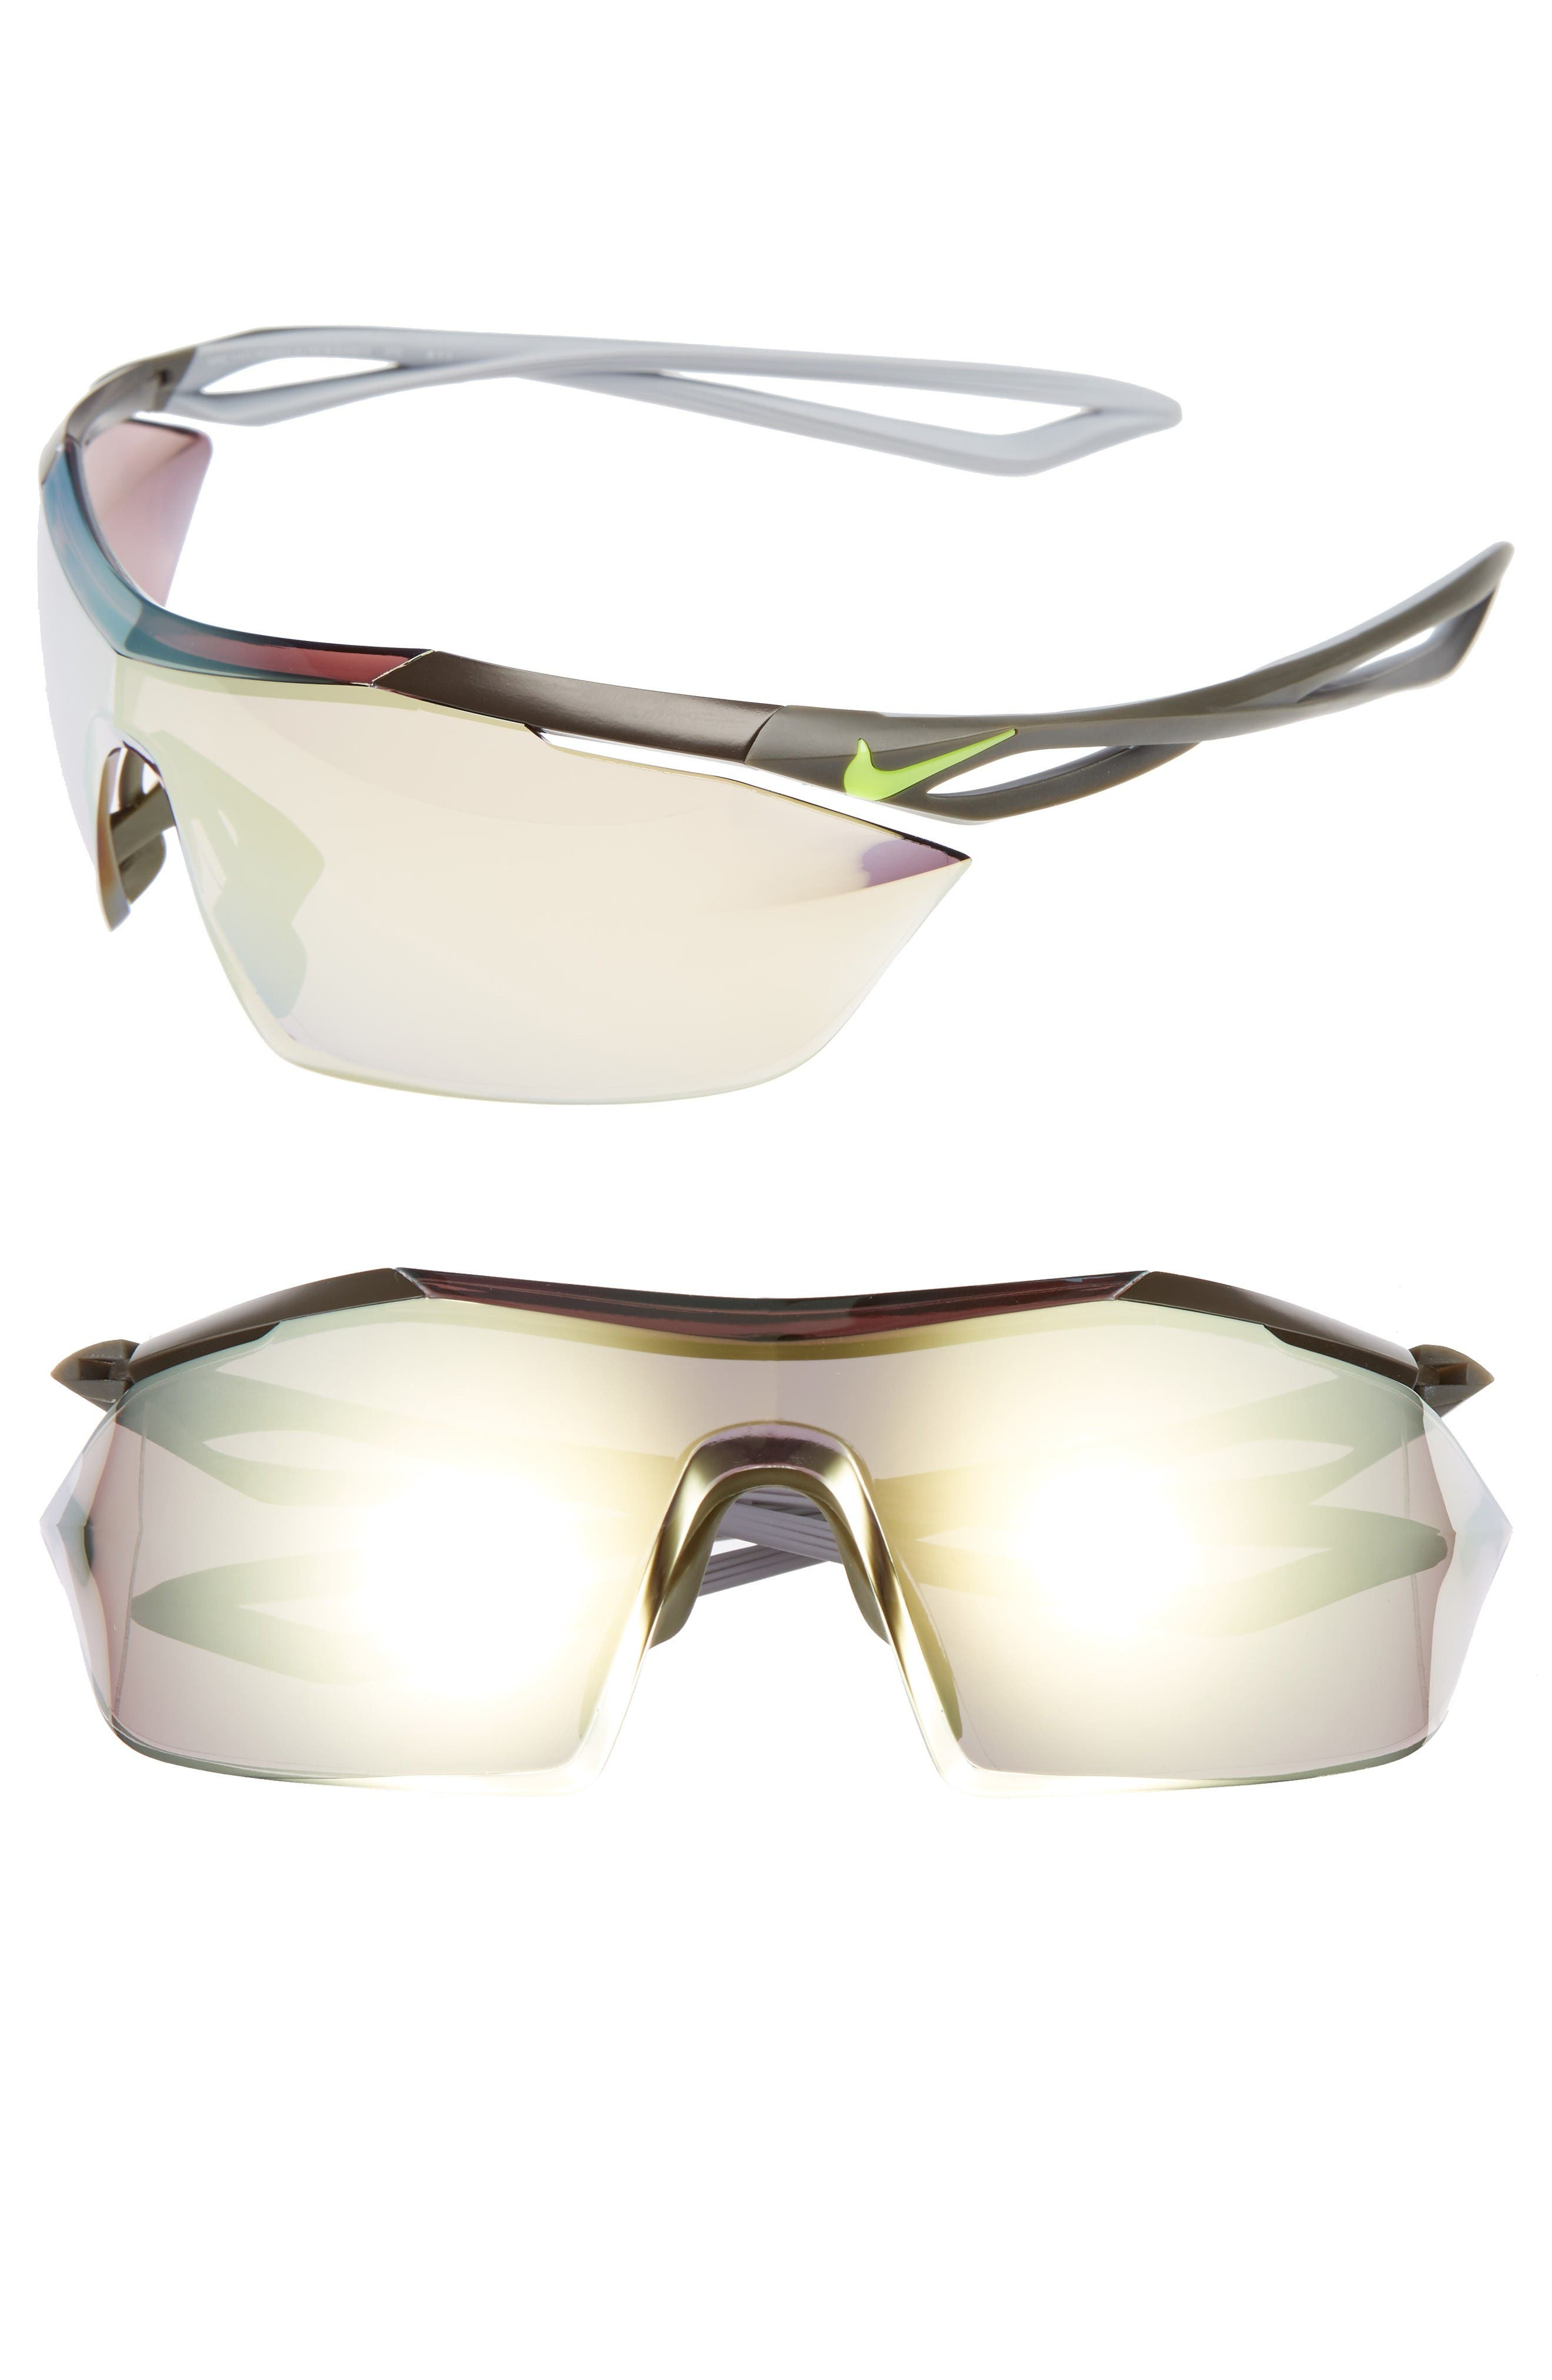 Vaporwing Elite 90mm Running Sunglasses,                         Main,                         color, Cargo Khaki/ Volt